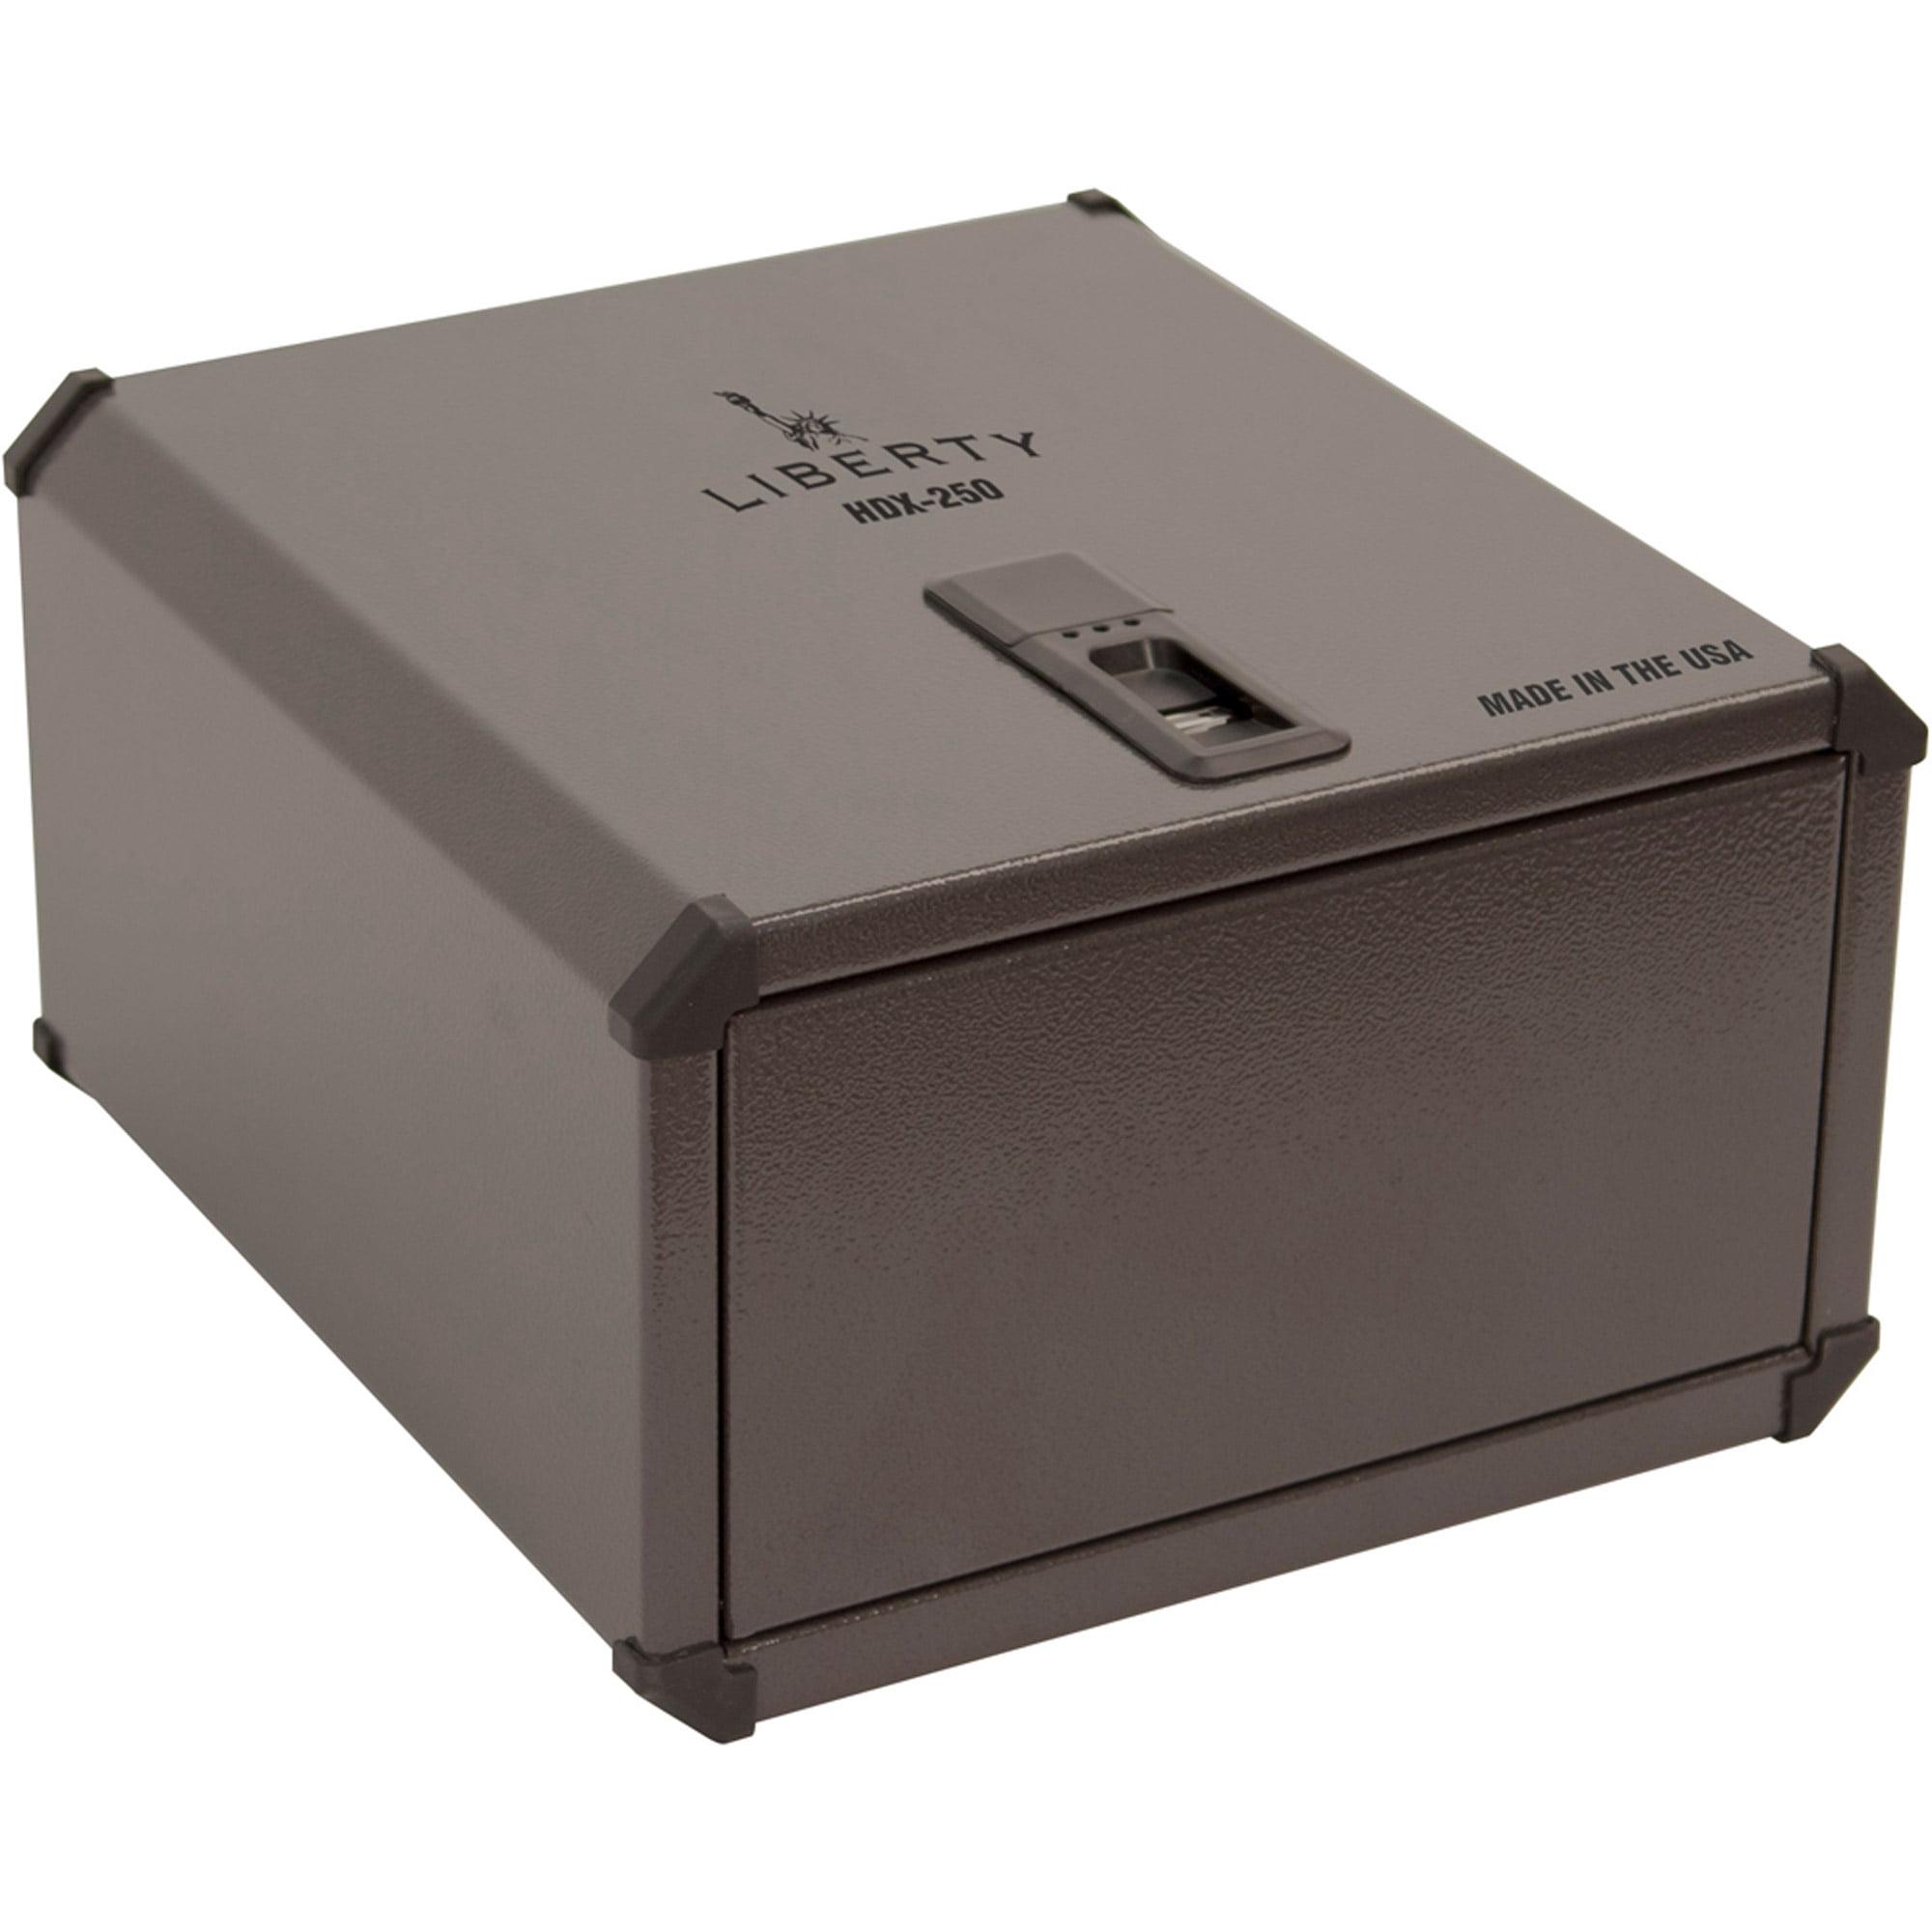 Liberty HDX-250 Smart Vault Biometric Safe